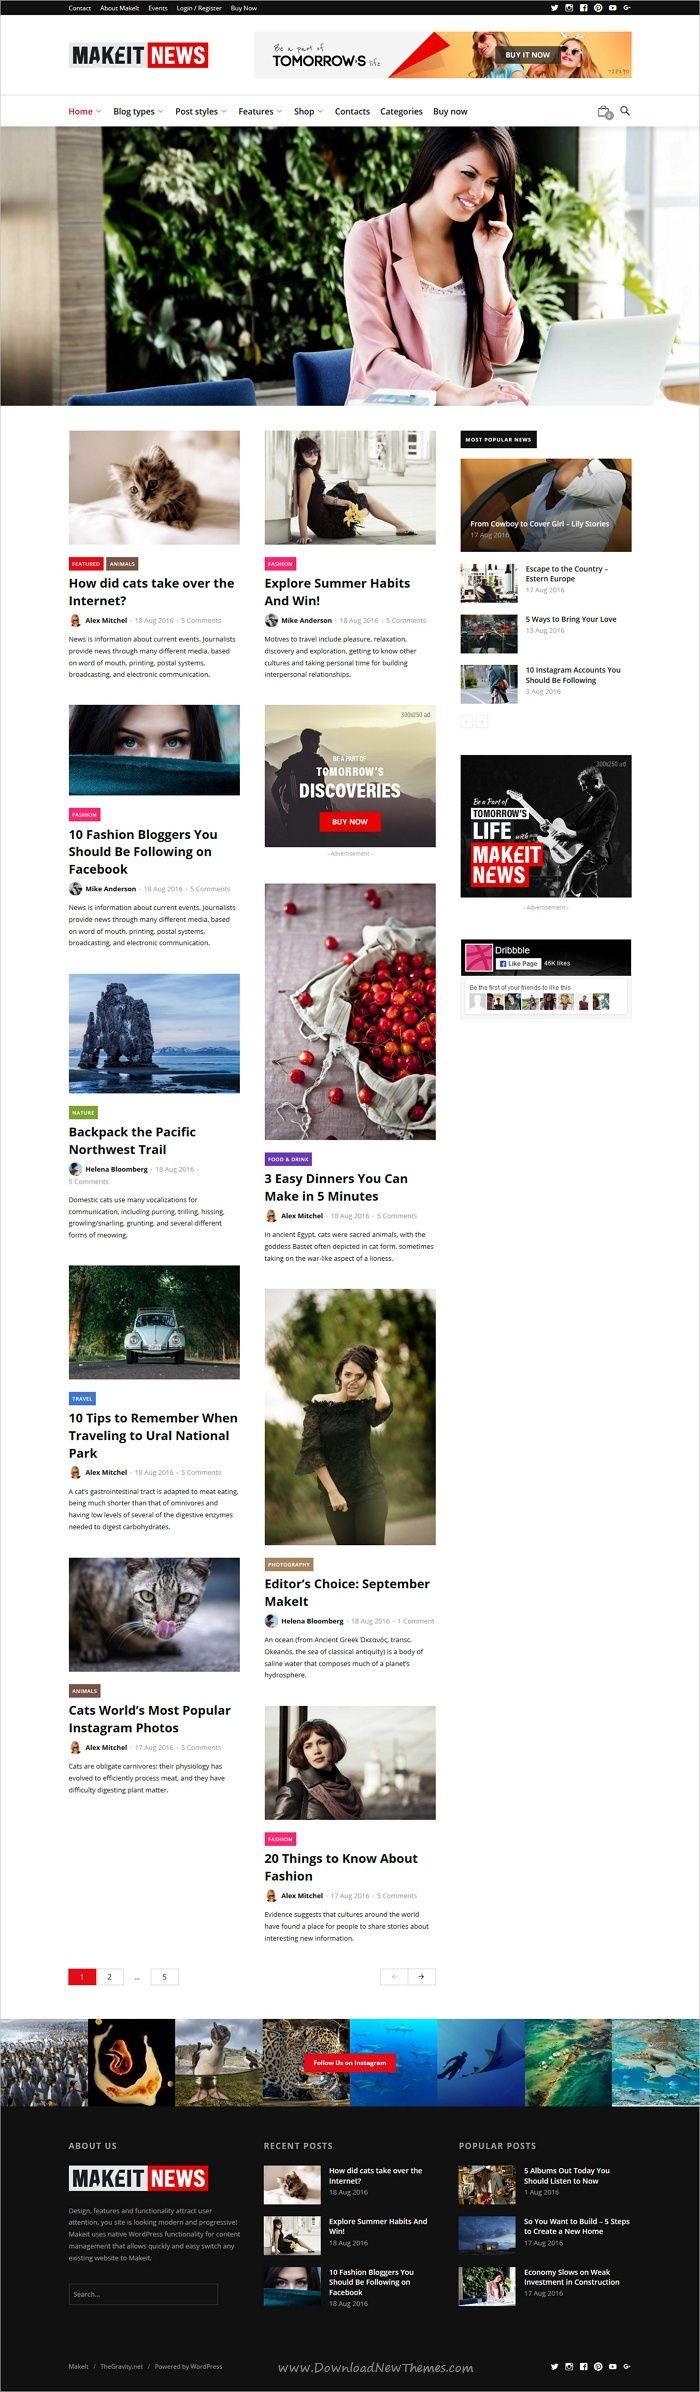 Makelt is a wonderful responsive #WordPress theme for #Newspaper, #magazine and blogs website with multiple homepage layouts download now➩ https://themeforest.net/item/makeit-blog-magazine-wordpress-theme/19378995?ref=Datasata